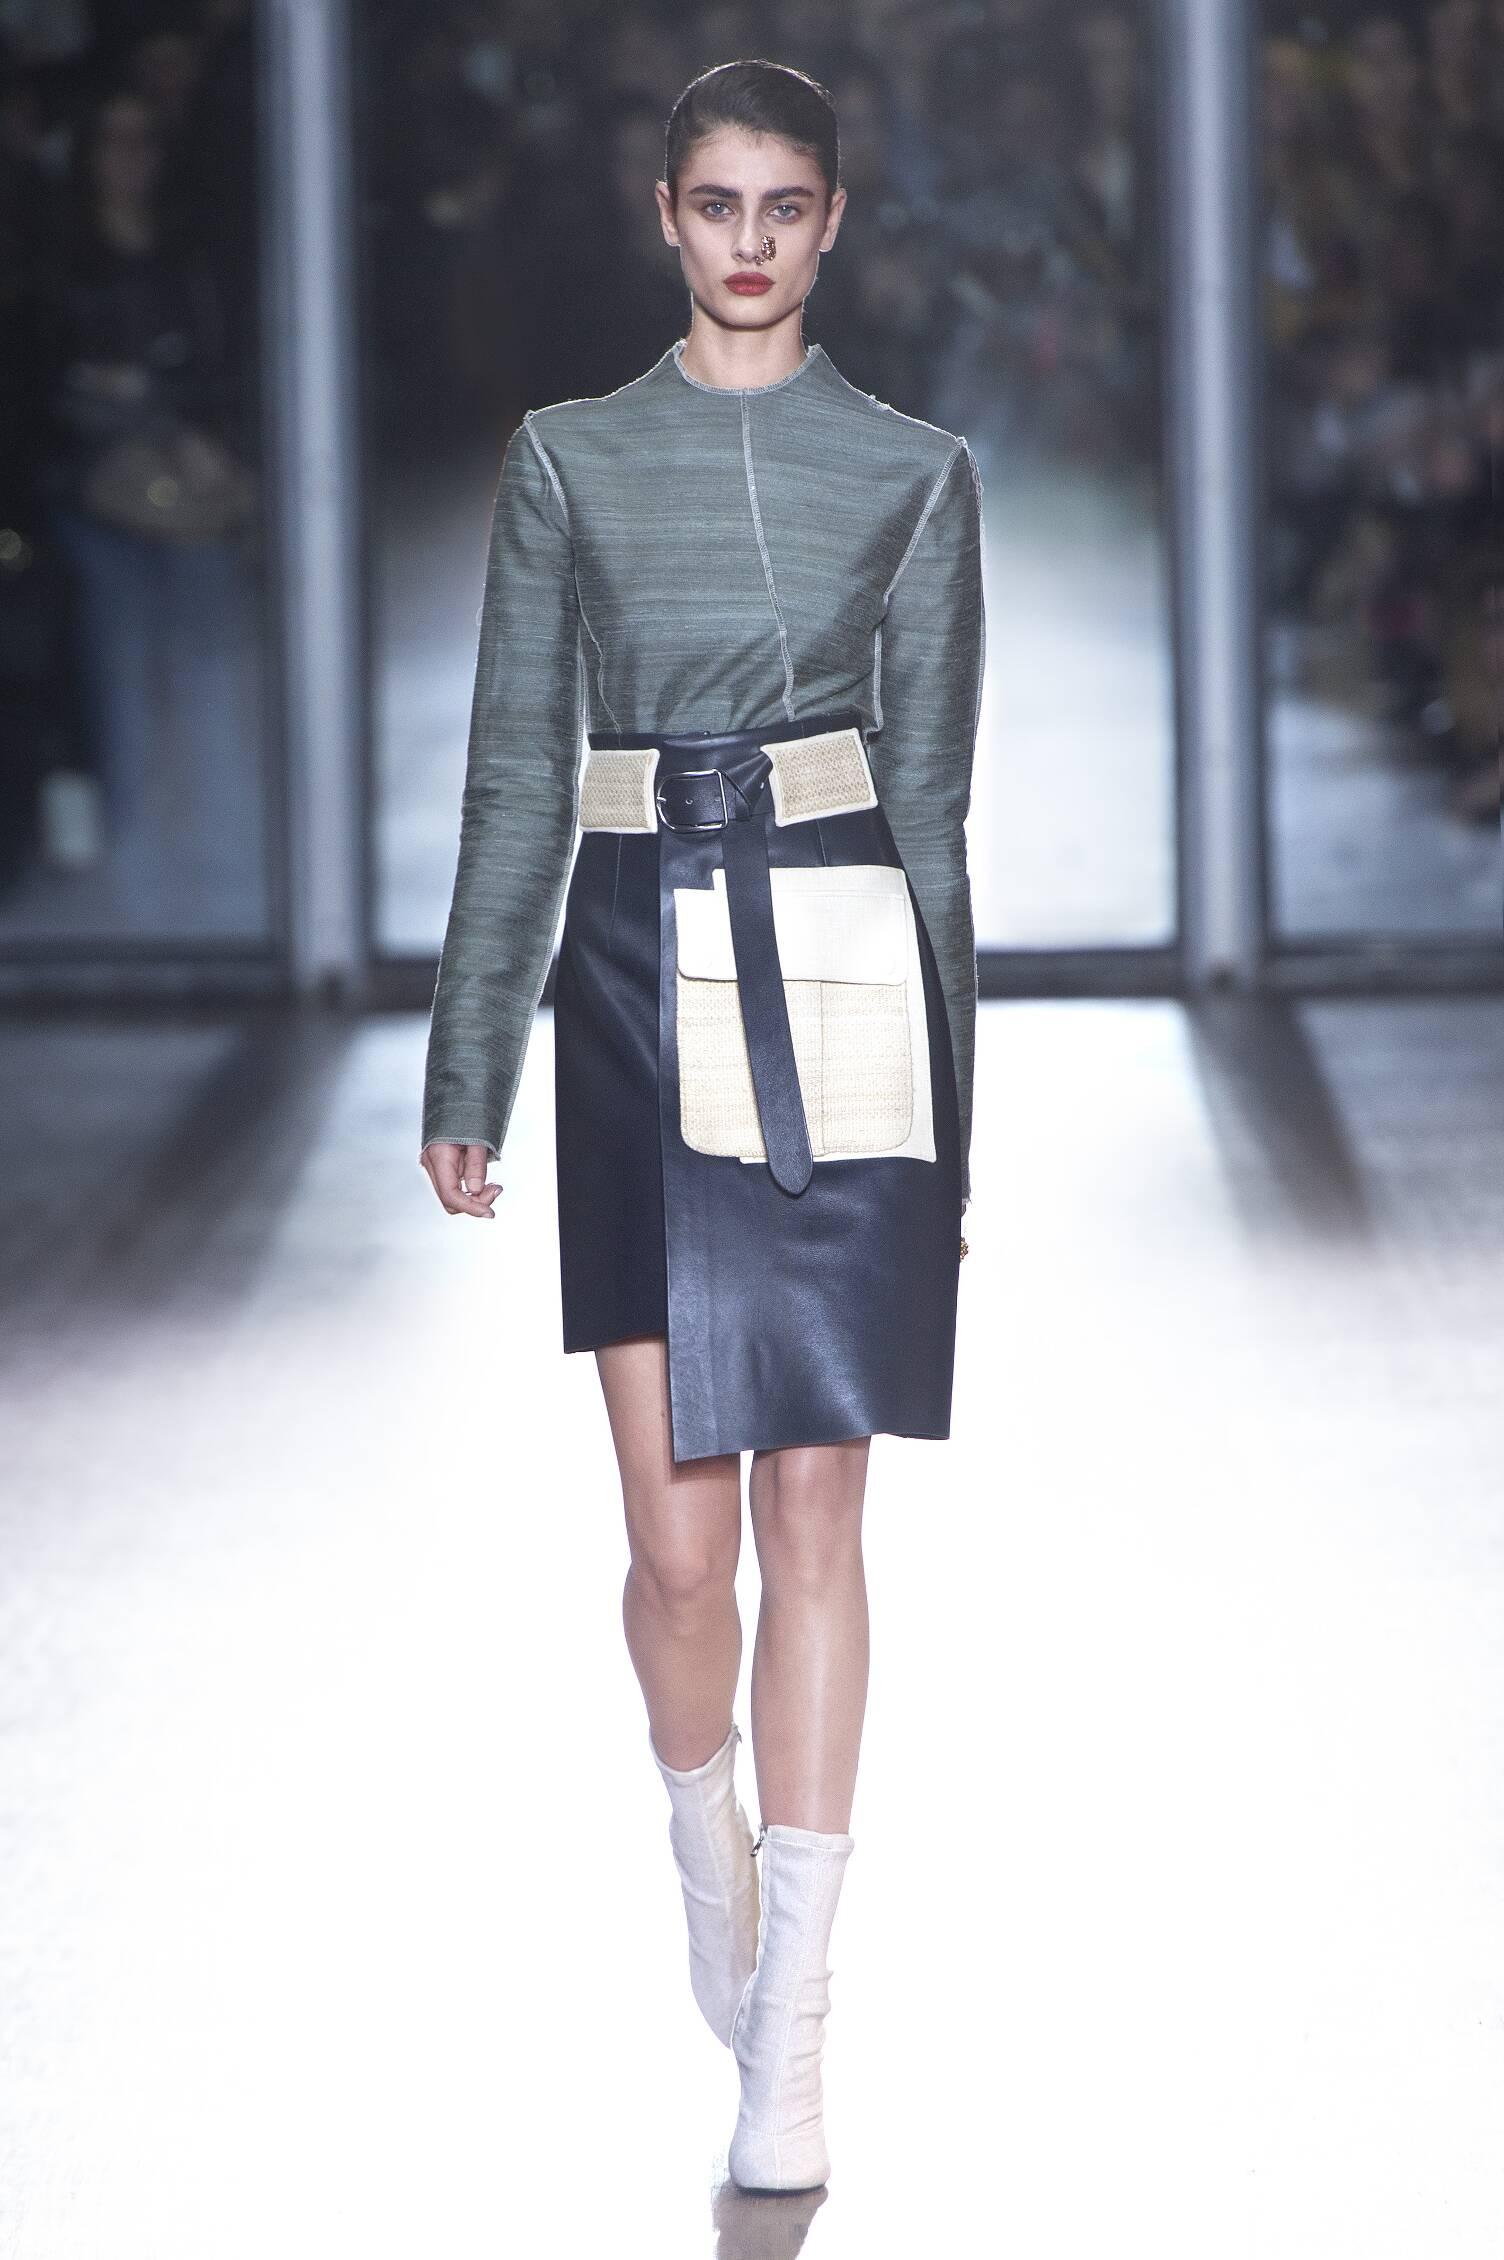 Acne Studios Collection Paris Fashion Week Womenswear